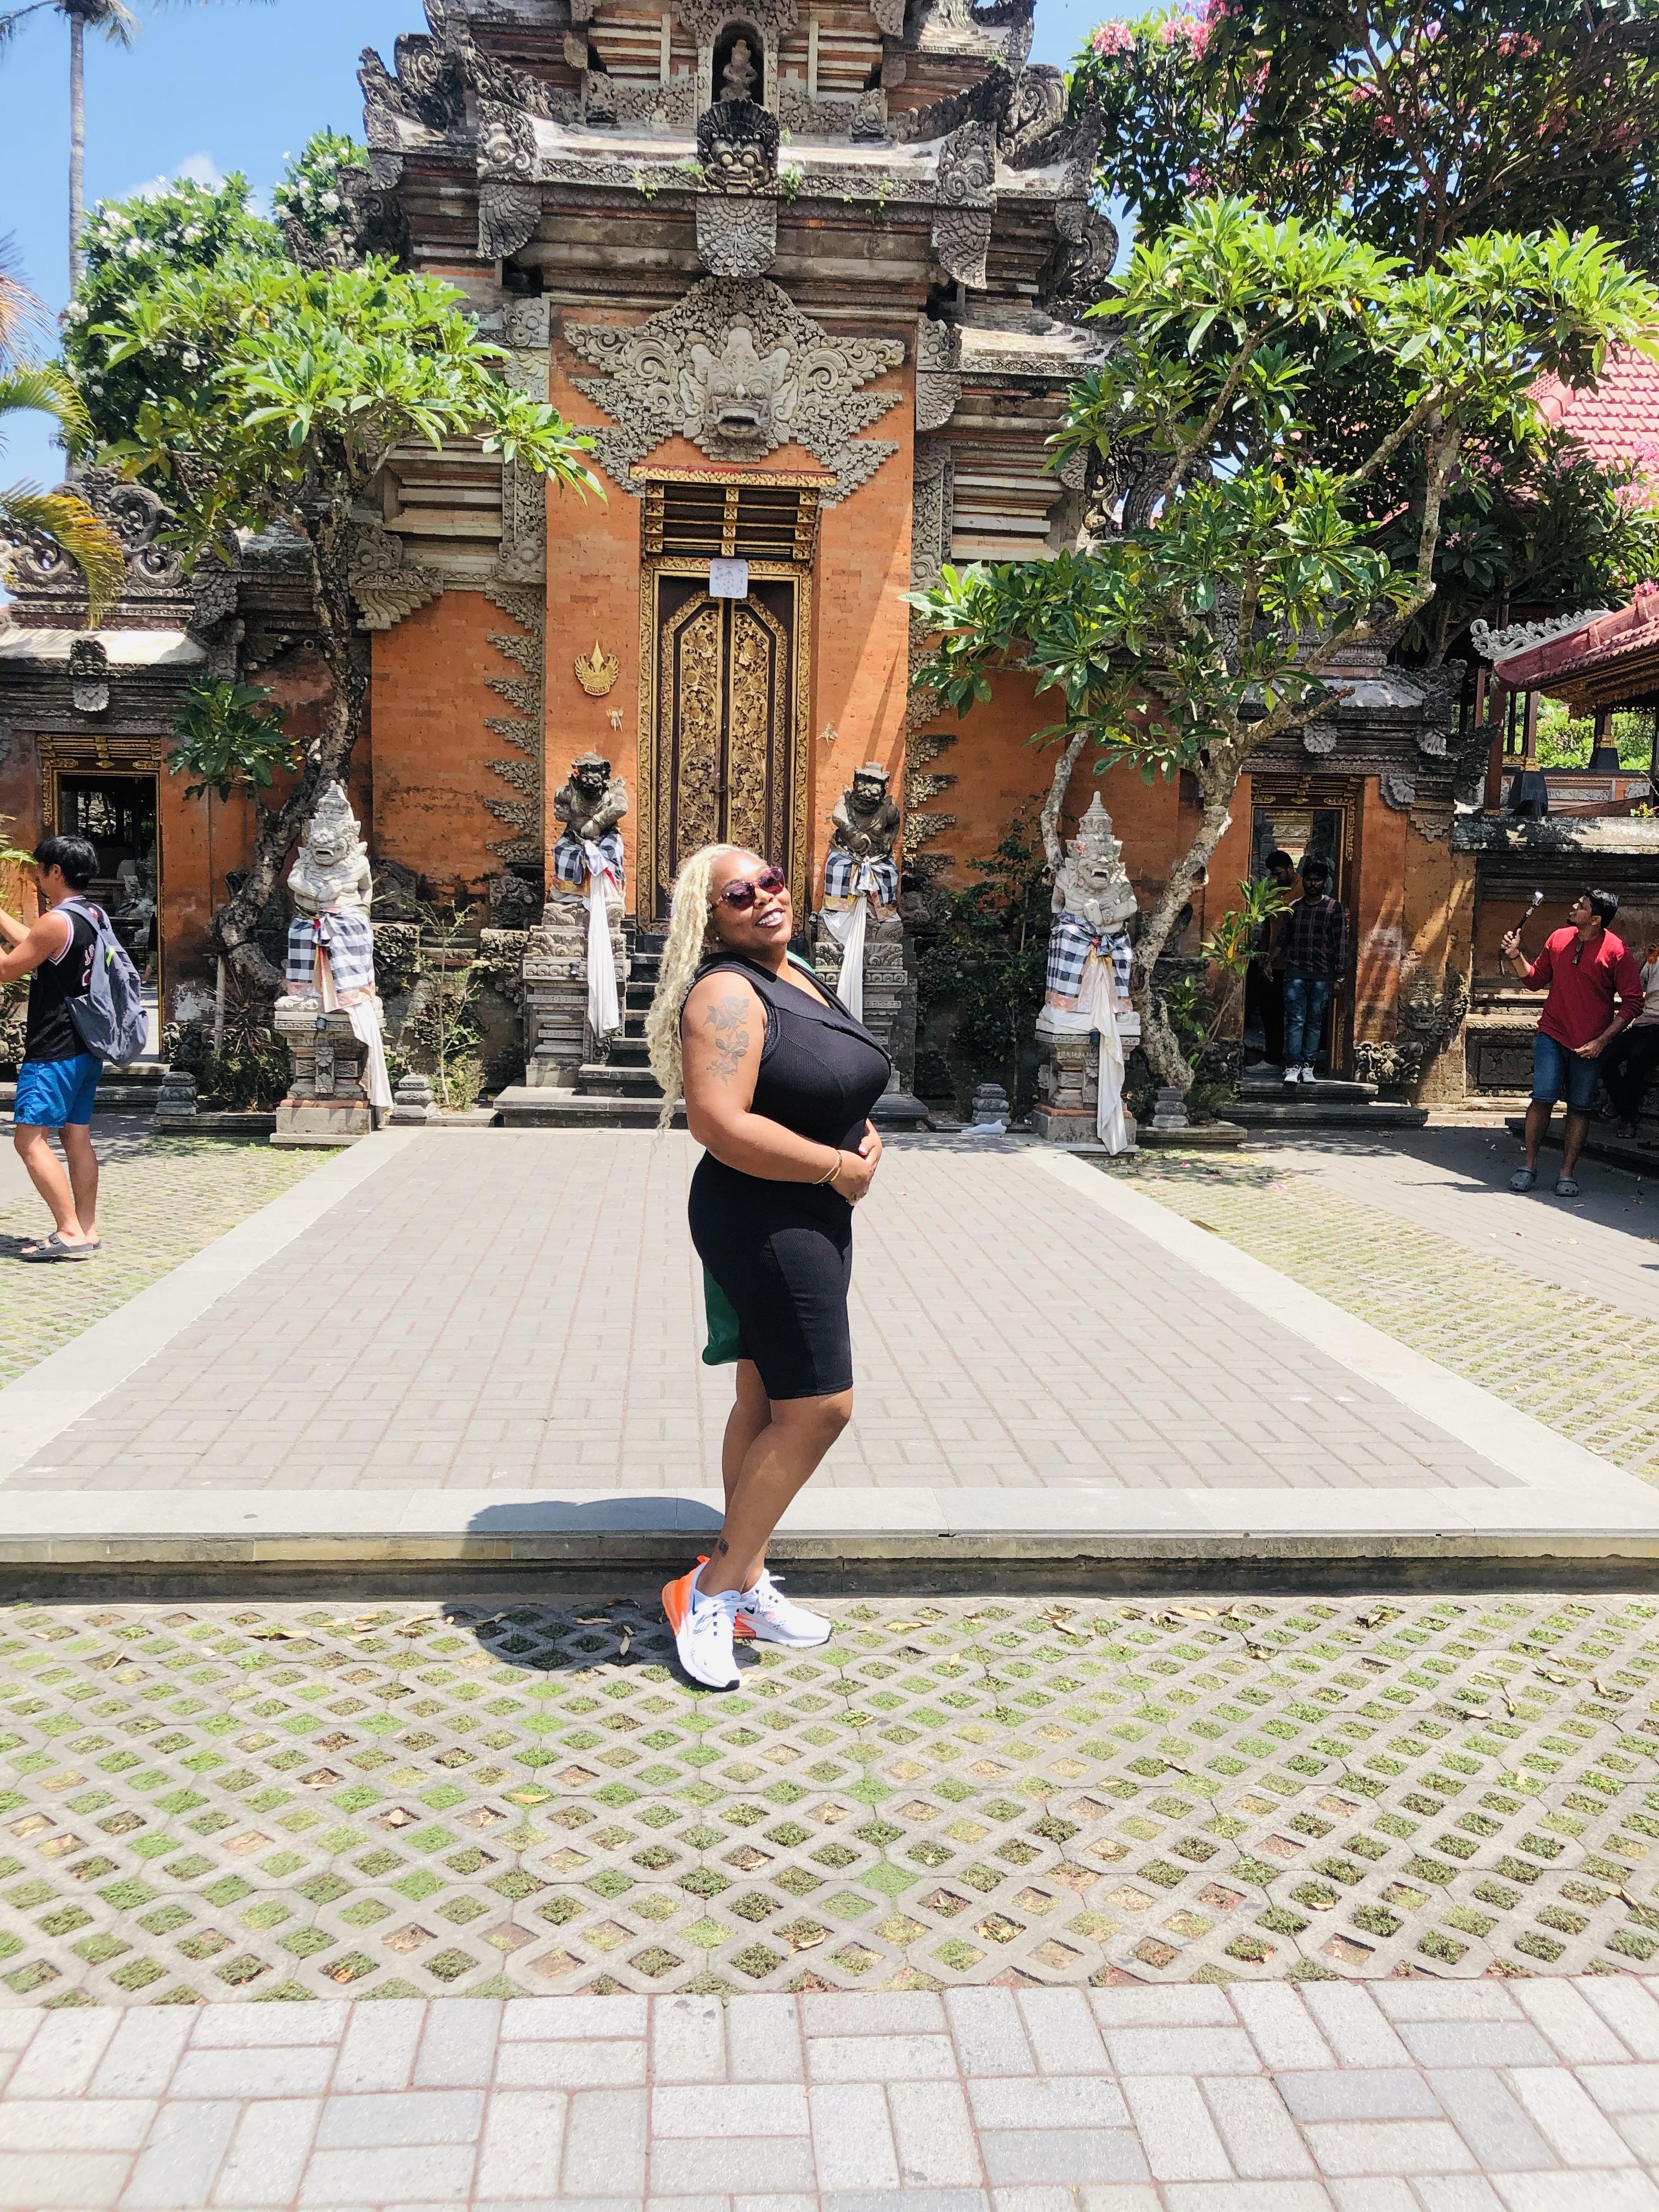 Nita Adi, How To Travel Solo